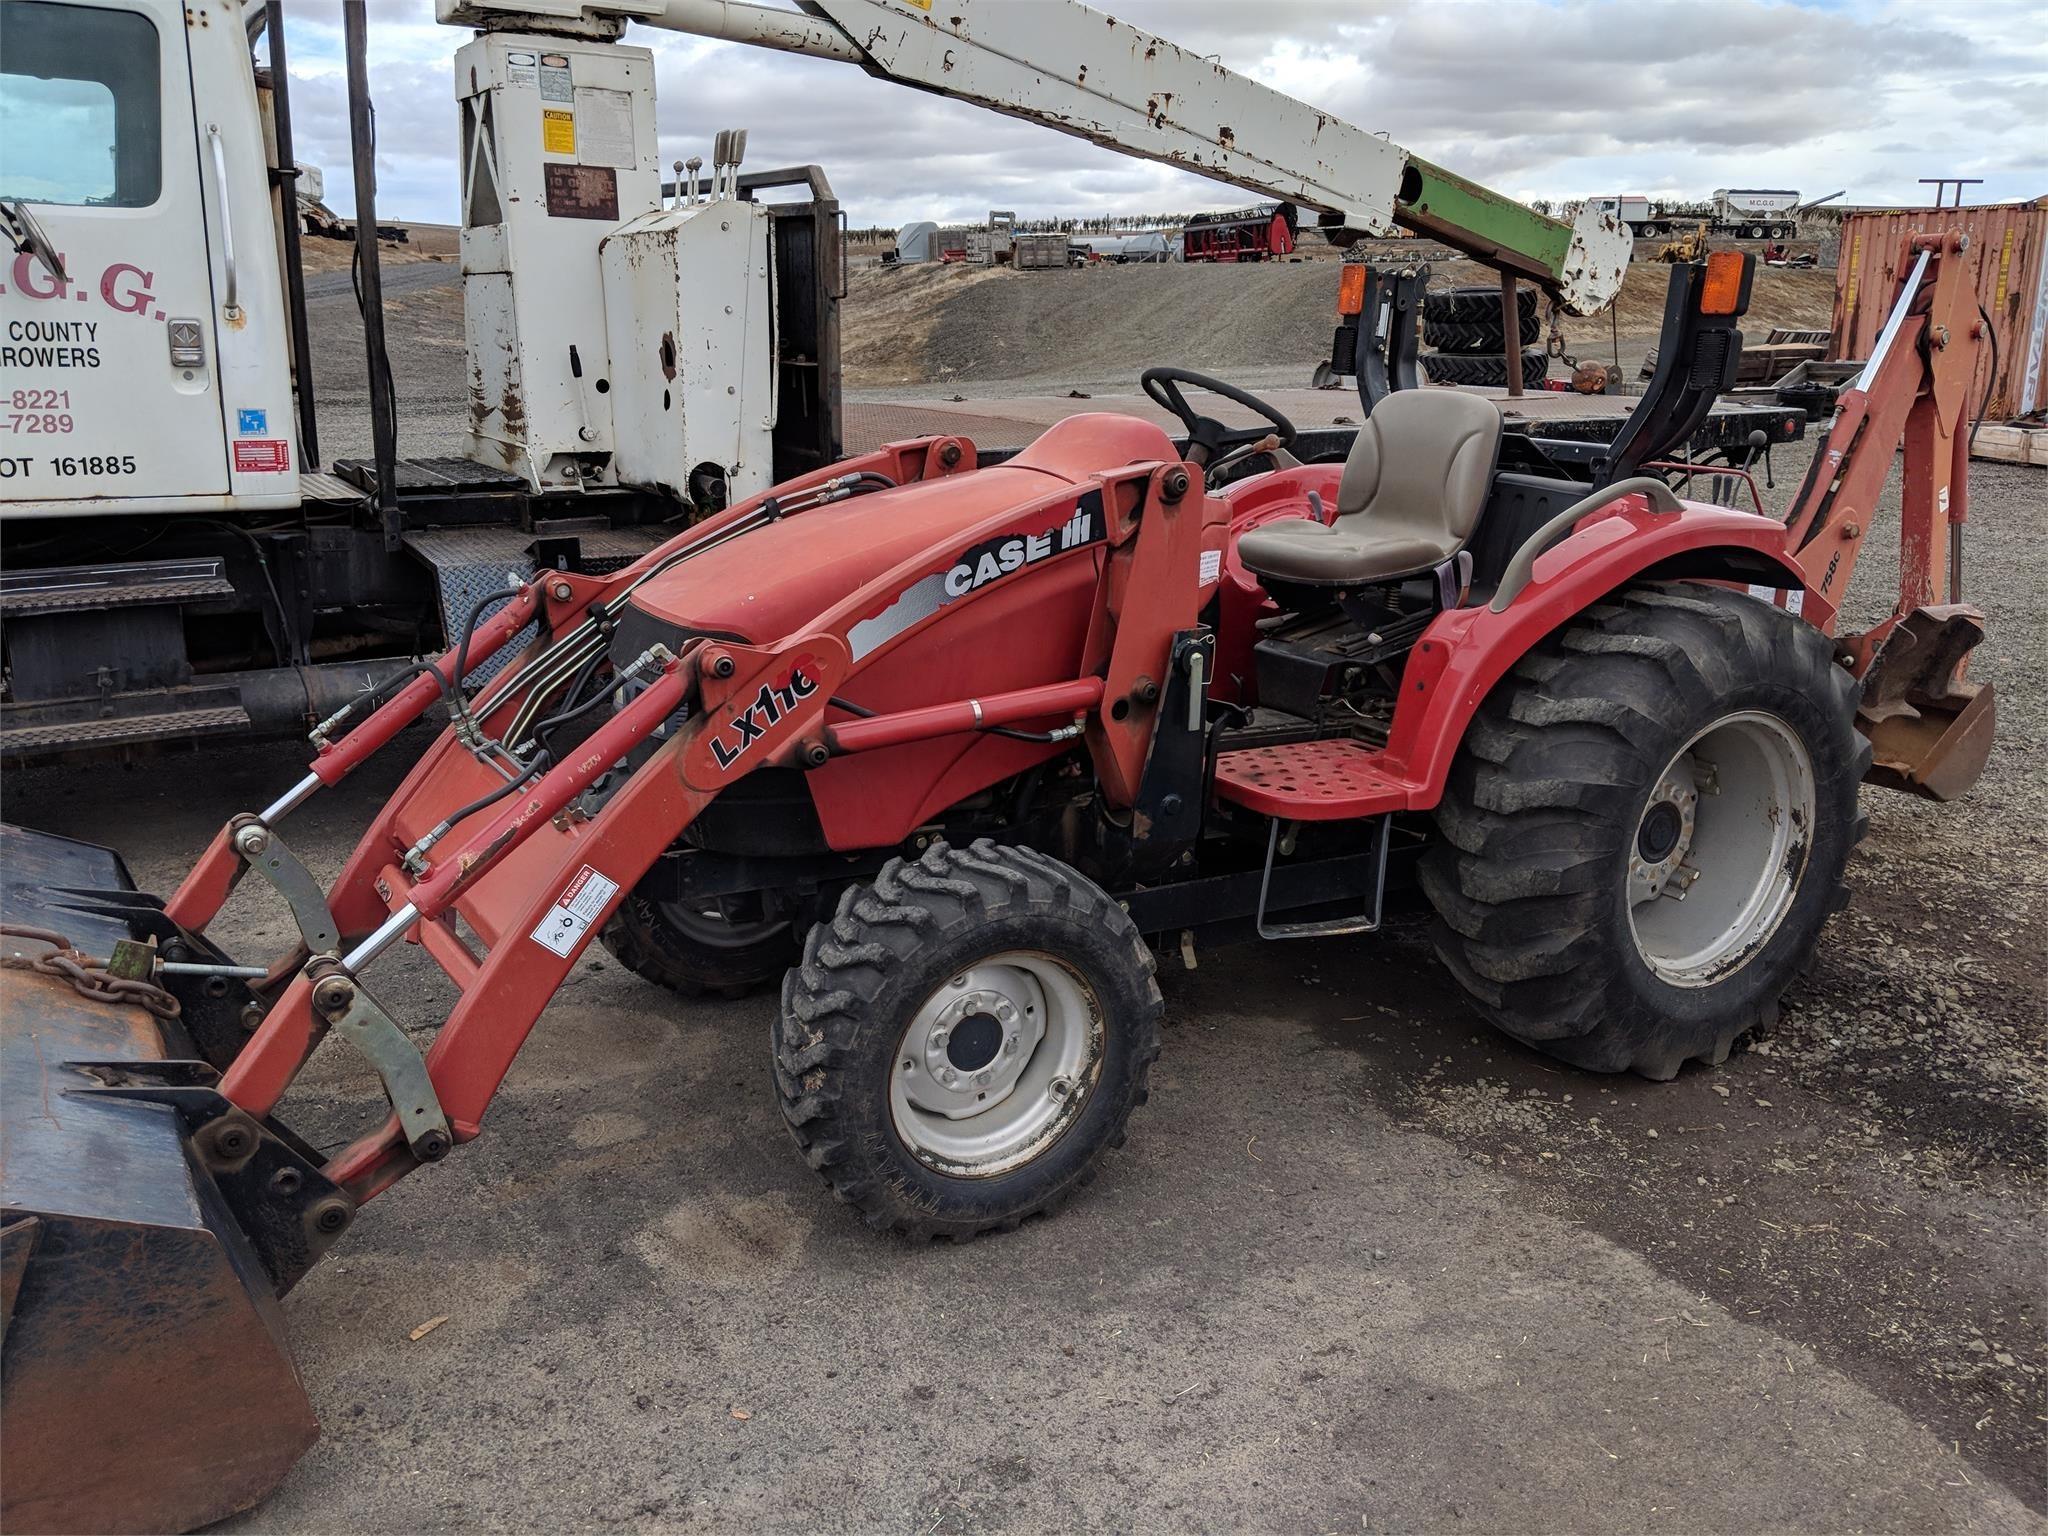 Case IH D35 Tractor